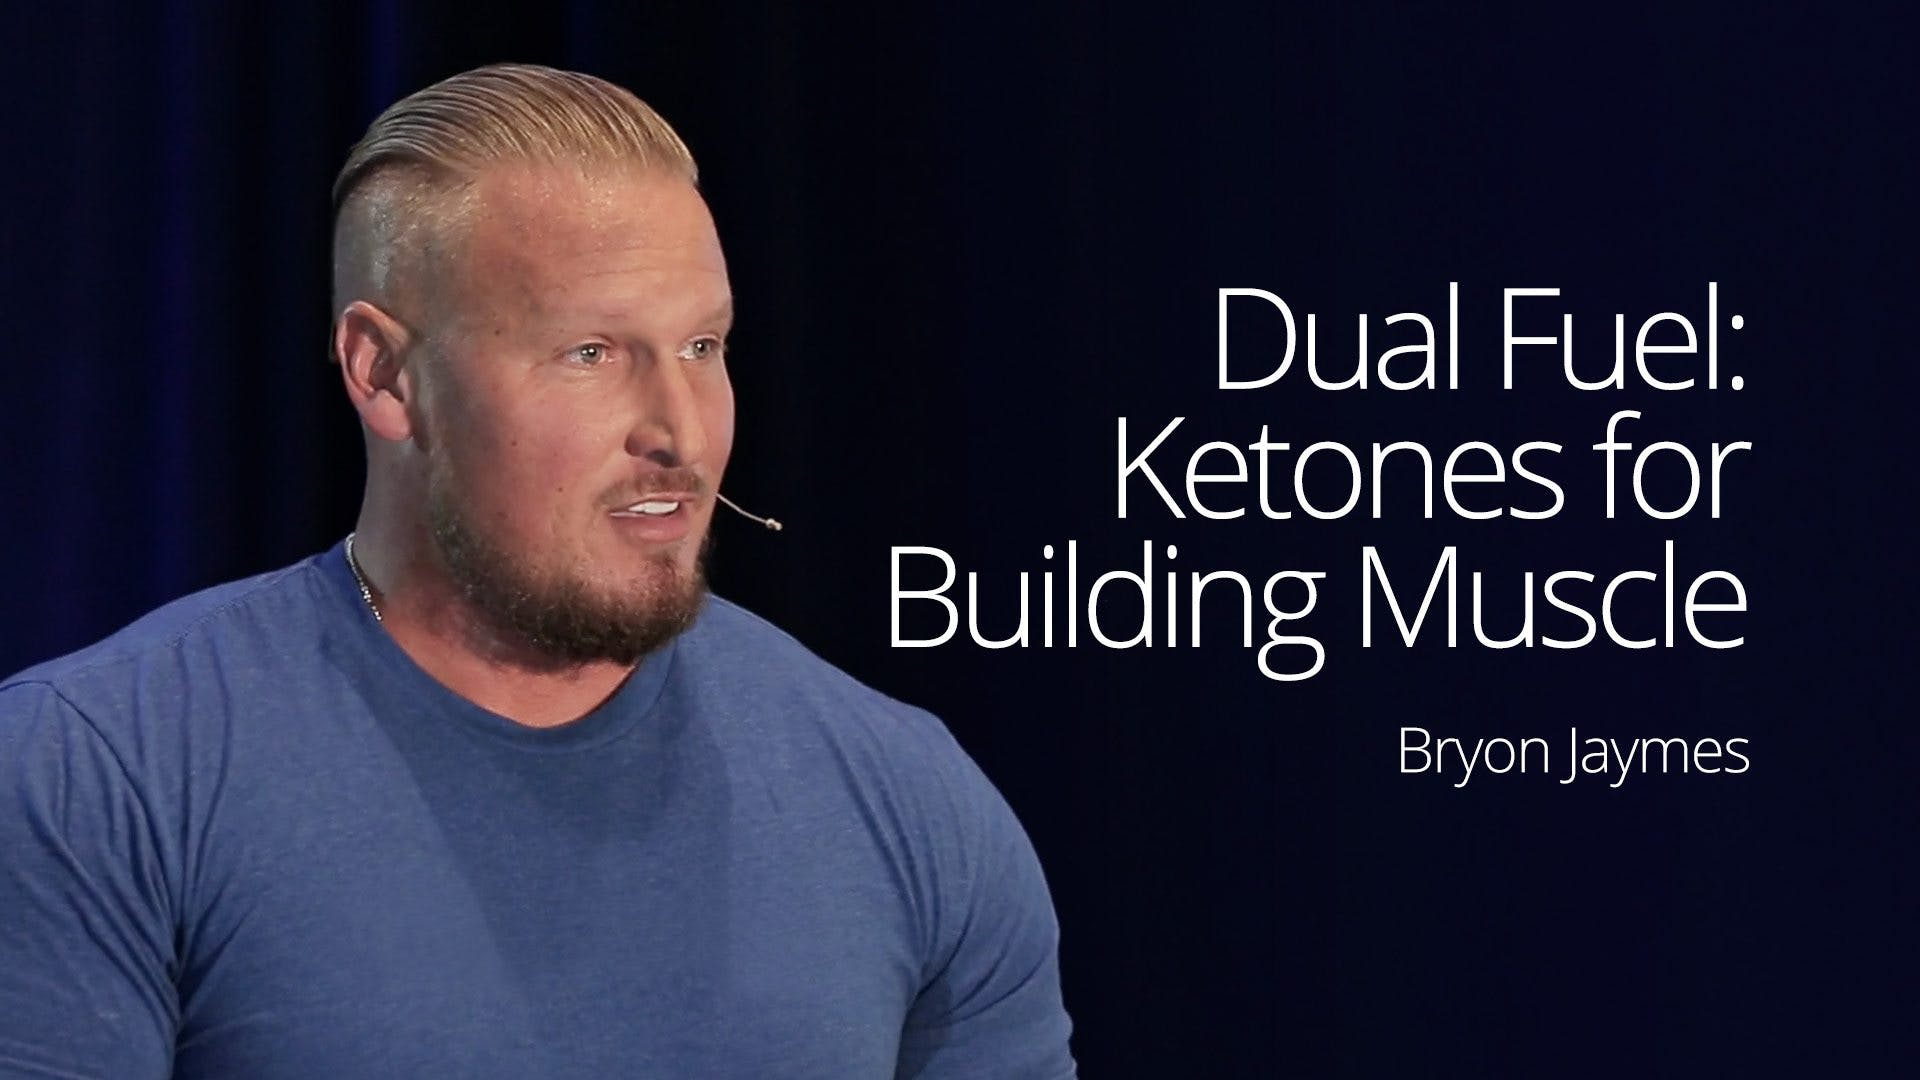 Dual Fuel: Ketones for Building Muscle